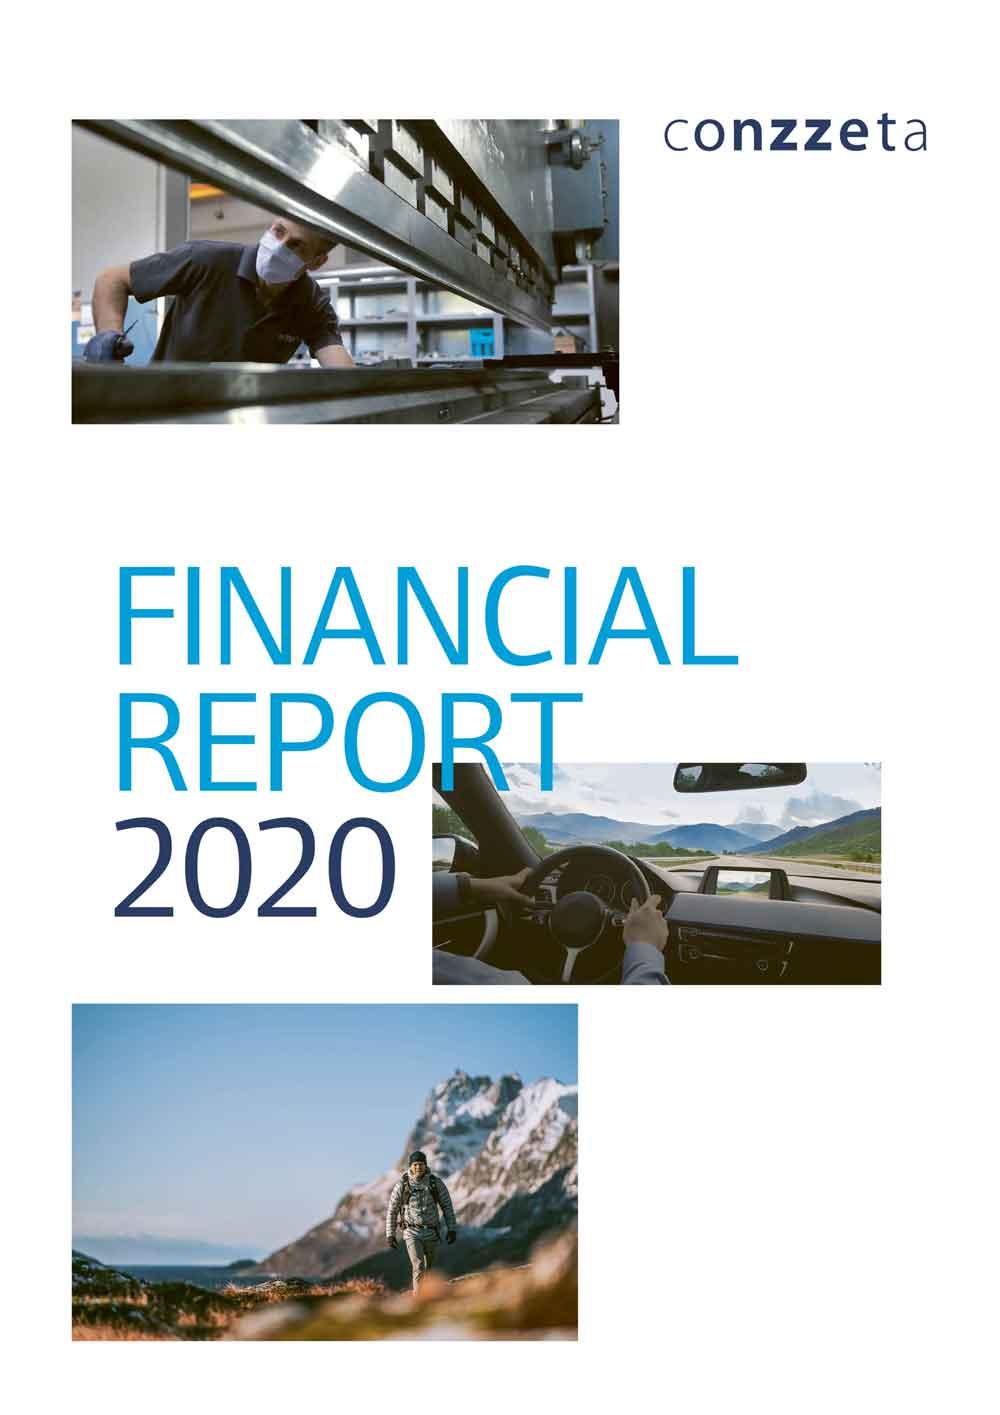 Financial Report 2020